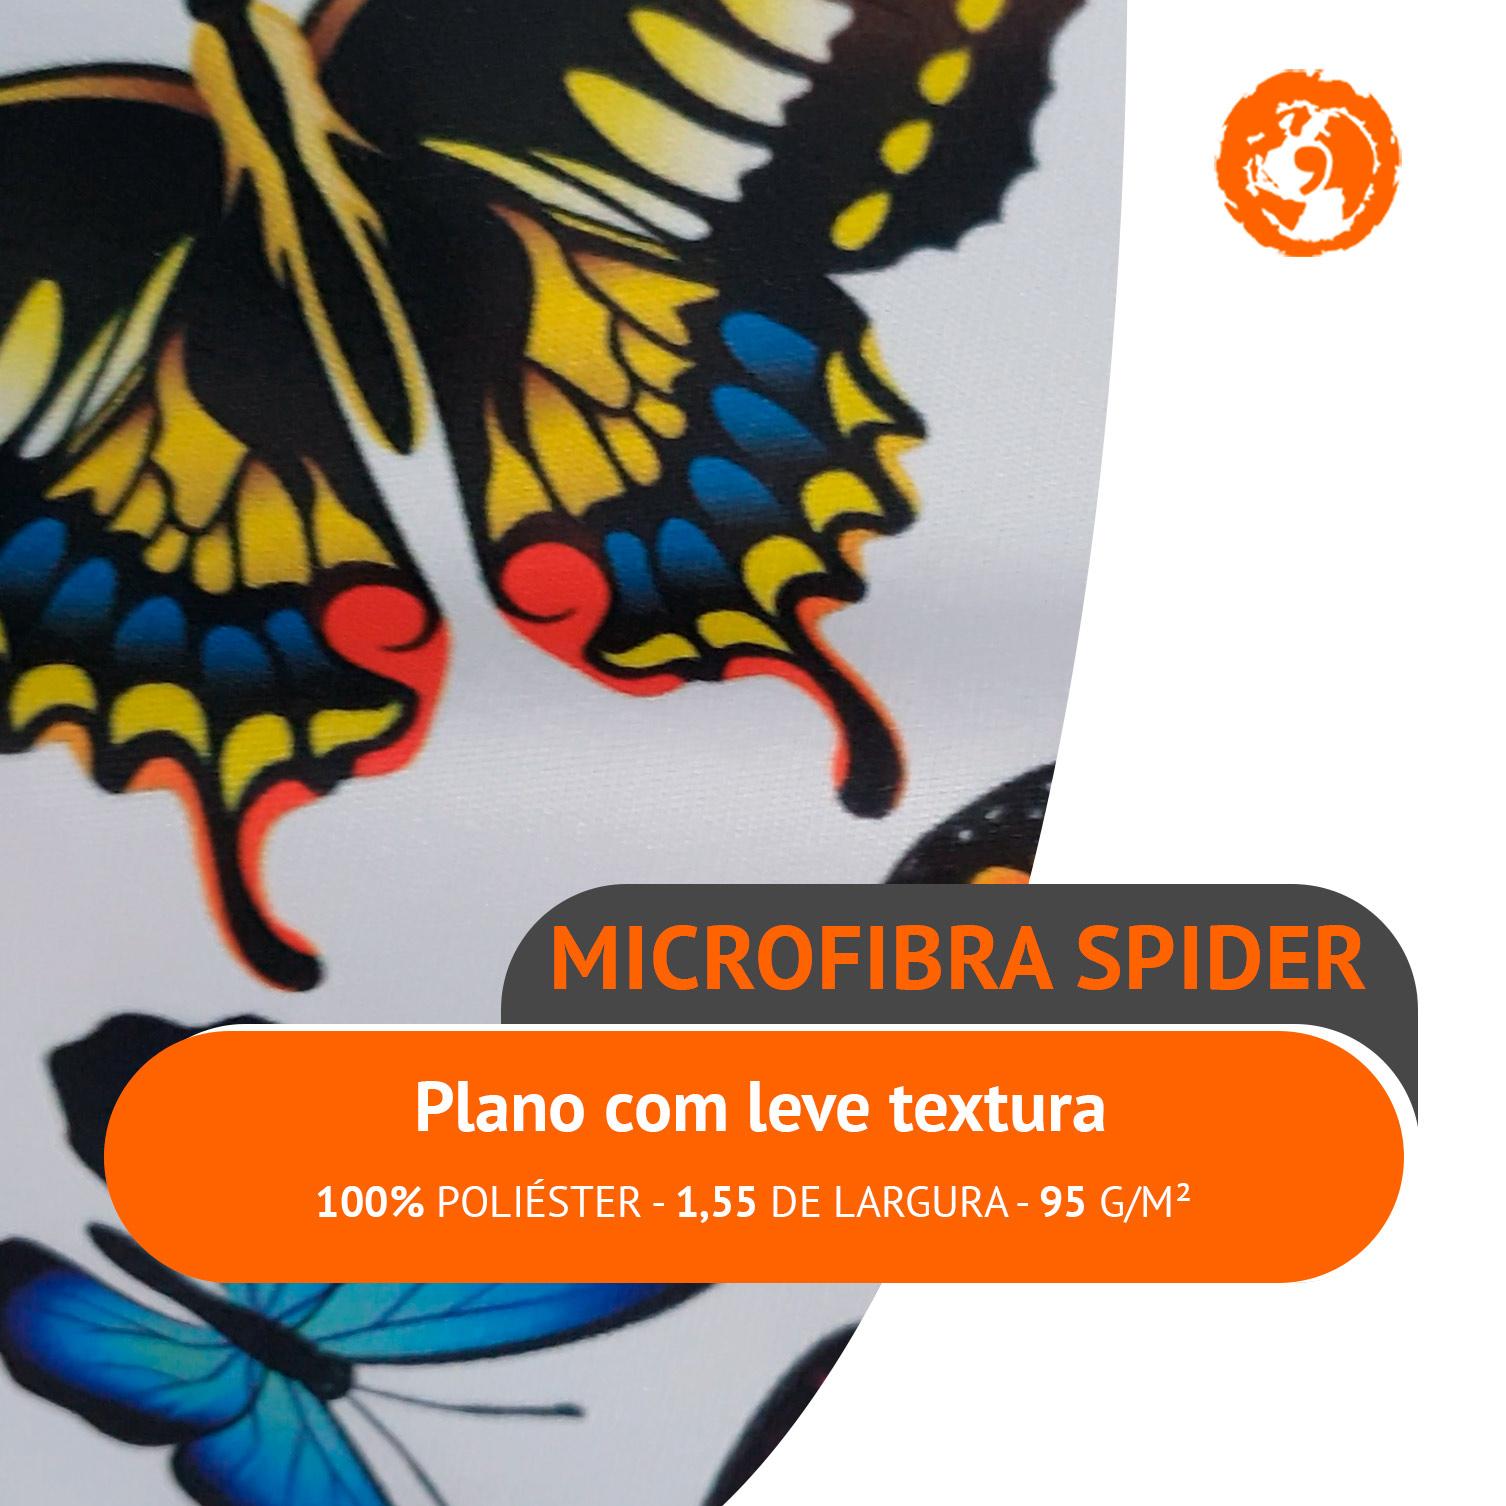 Microfibra Spider